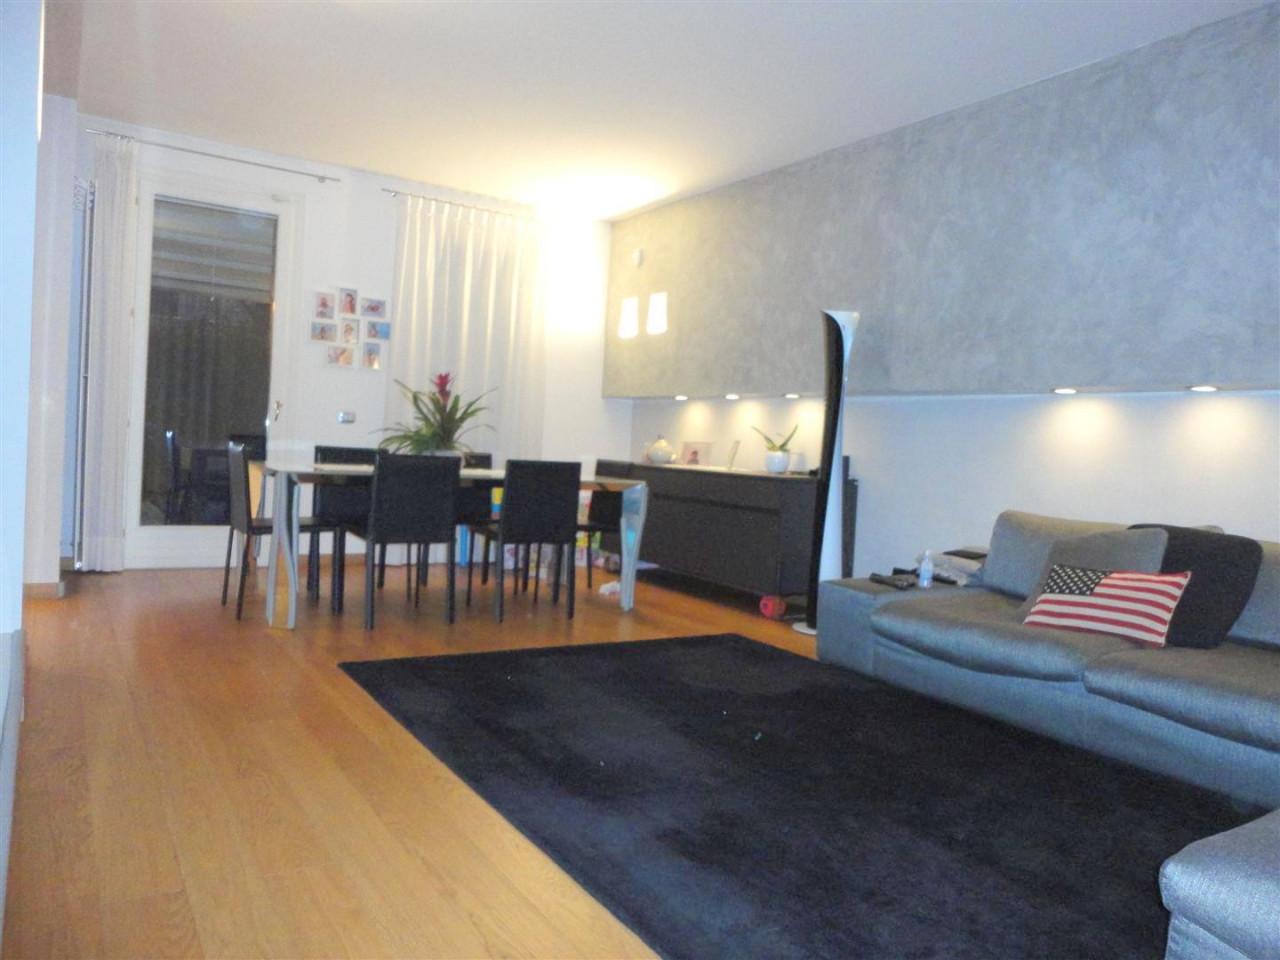 P402 Elegante Villa bifamiliare ad Abano Terme https://media.gestionaleimmobiliare.it/foto/annunci/200618/2259822/1280x1280/001__2.jpg